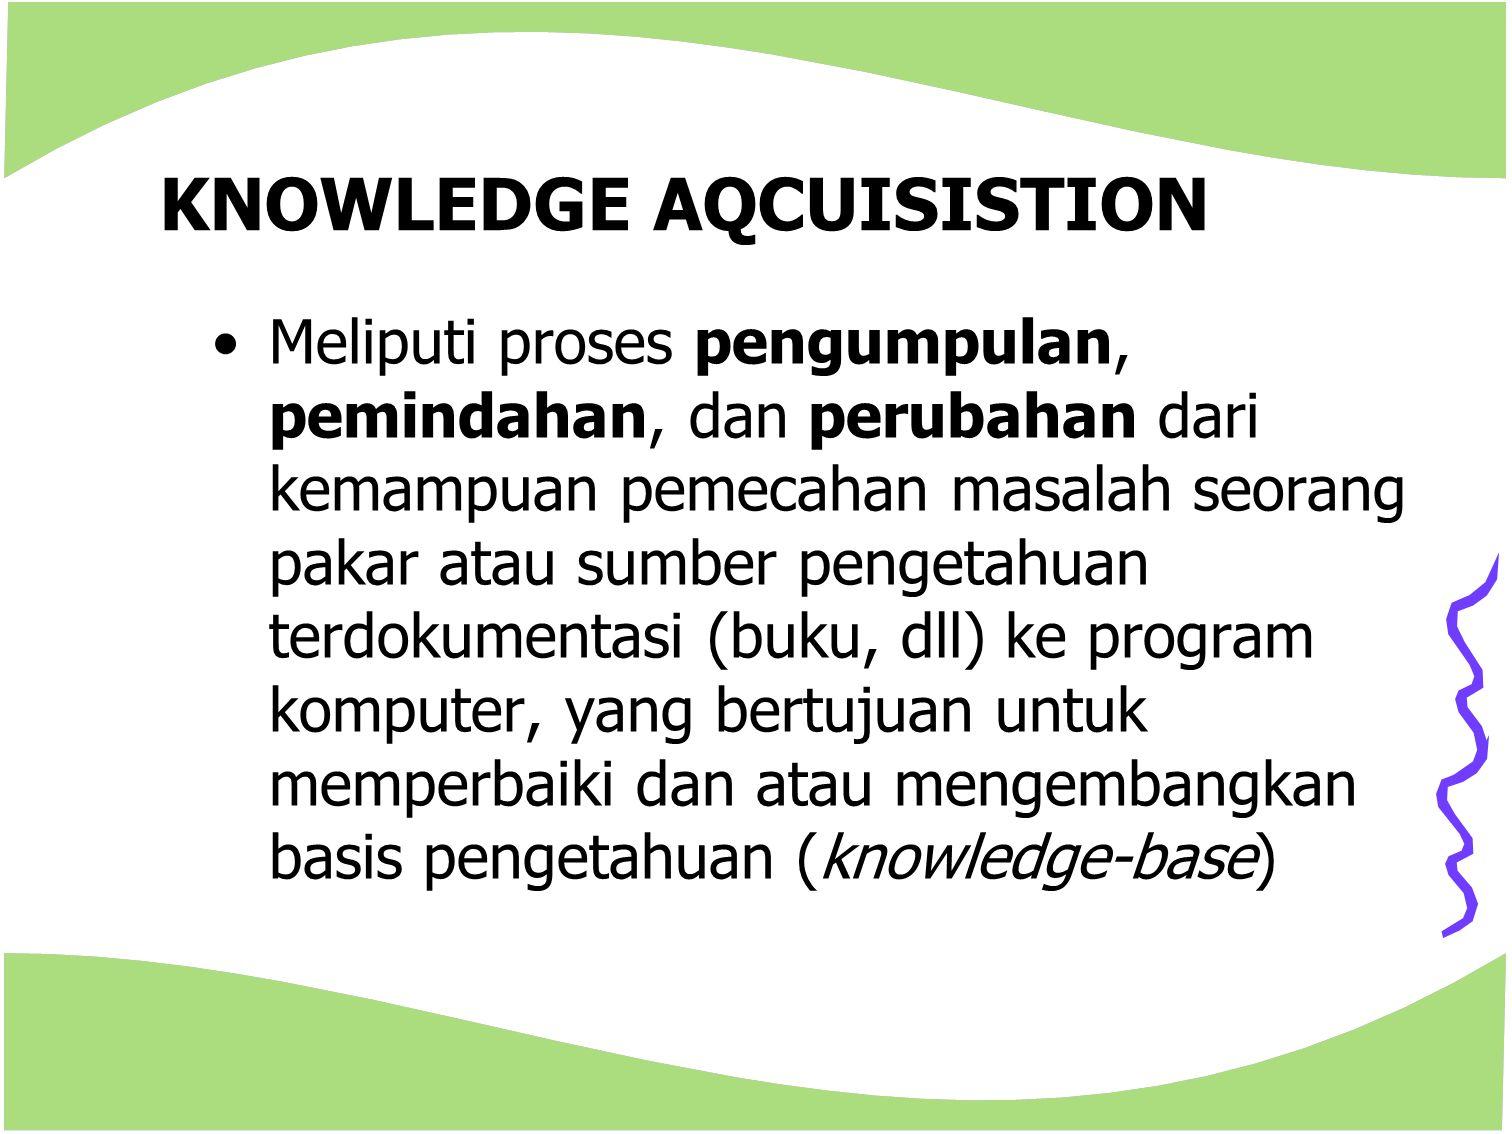 KNOWLEDGE AQCUISISTION Meliputi proses pengumpulan, pemindahan, dan perubahan dari kemampuan pemecahan masalah seorang pakar atau sumber pengetahuan t